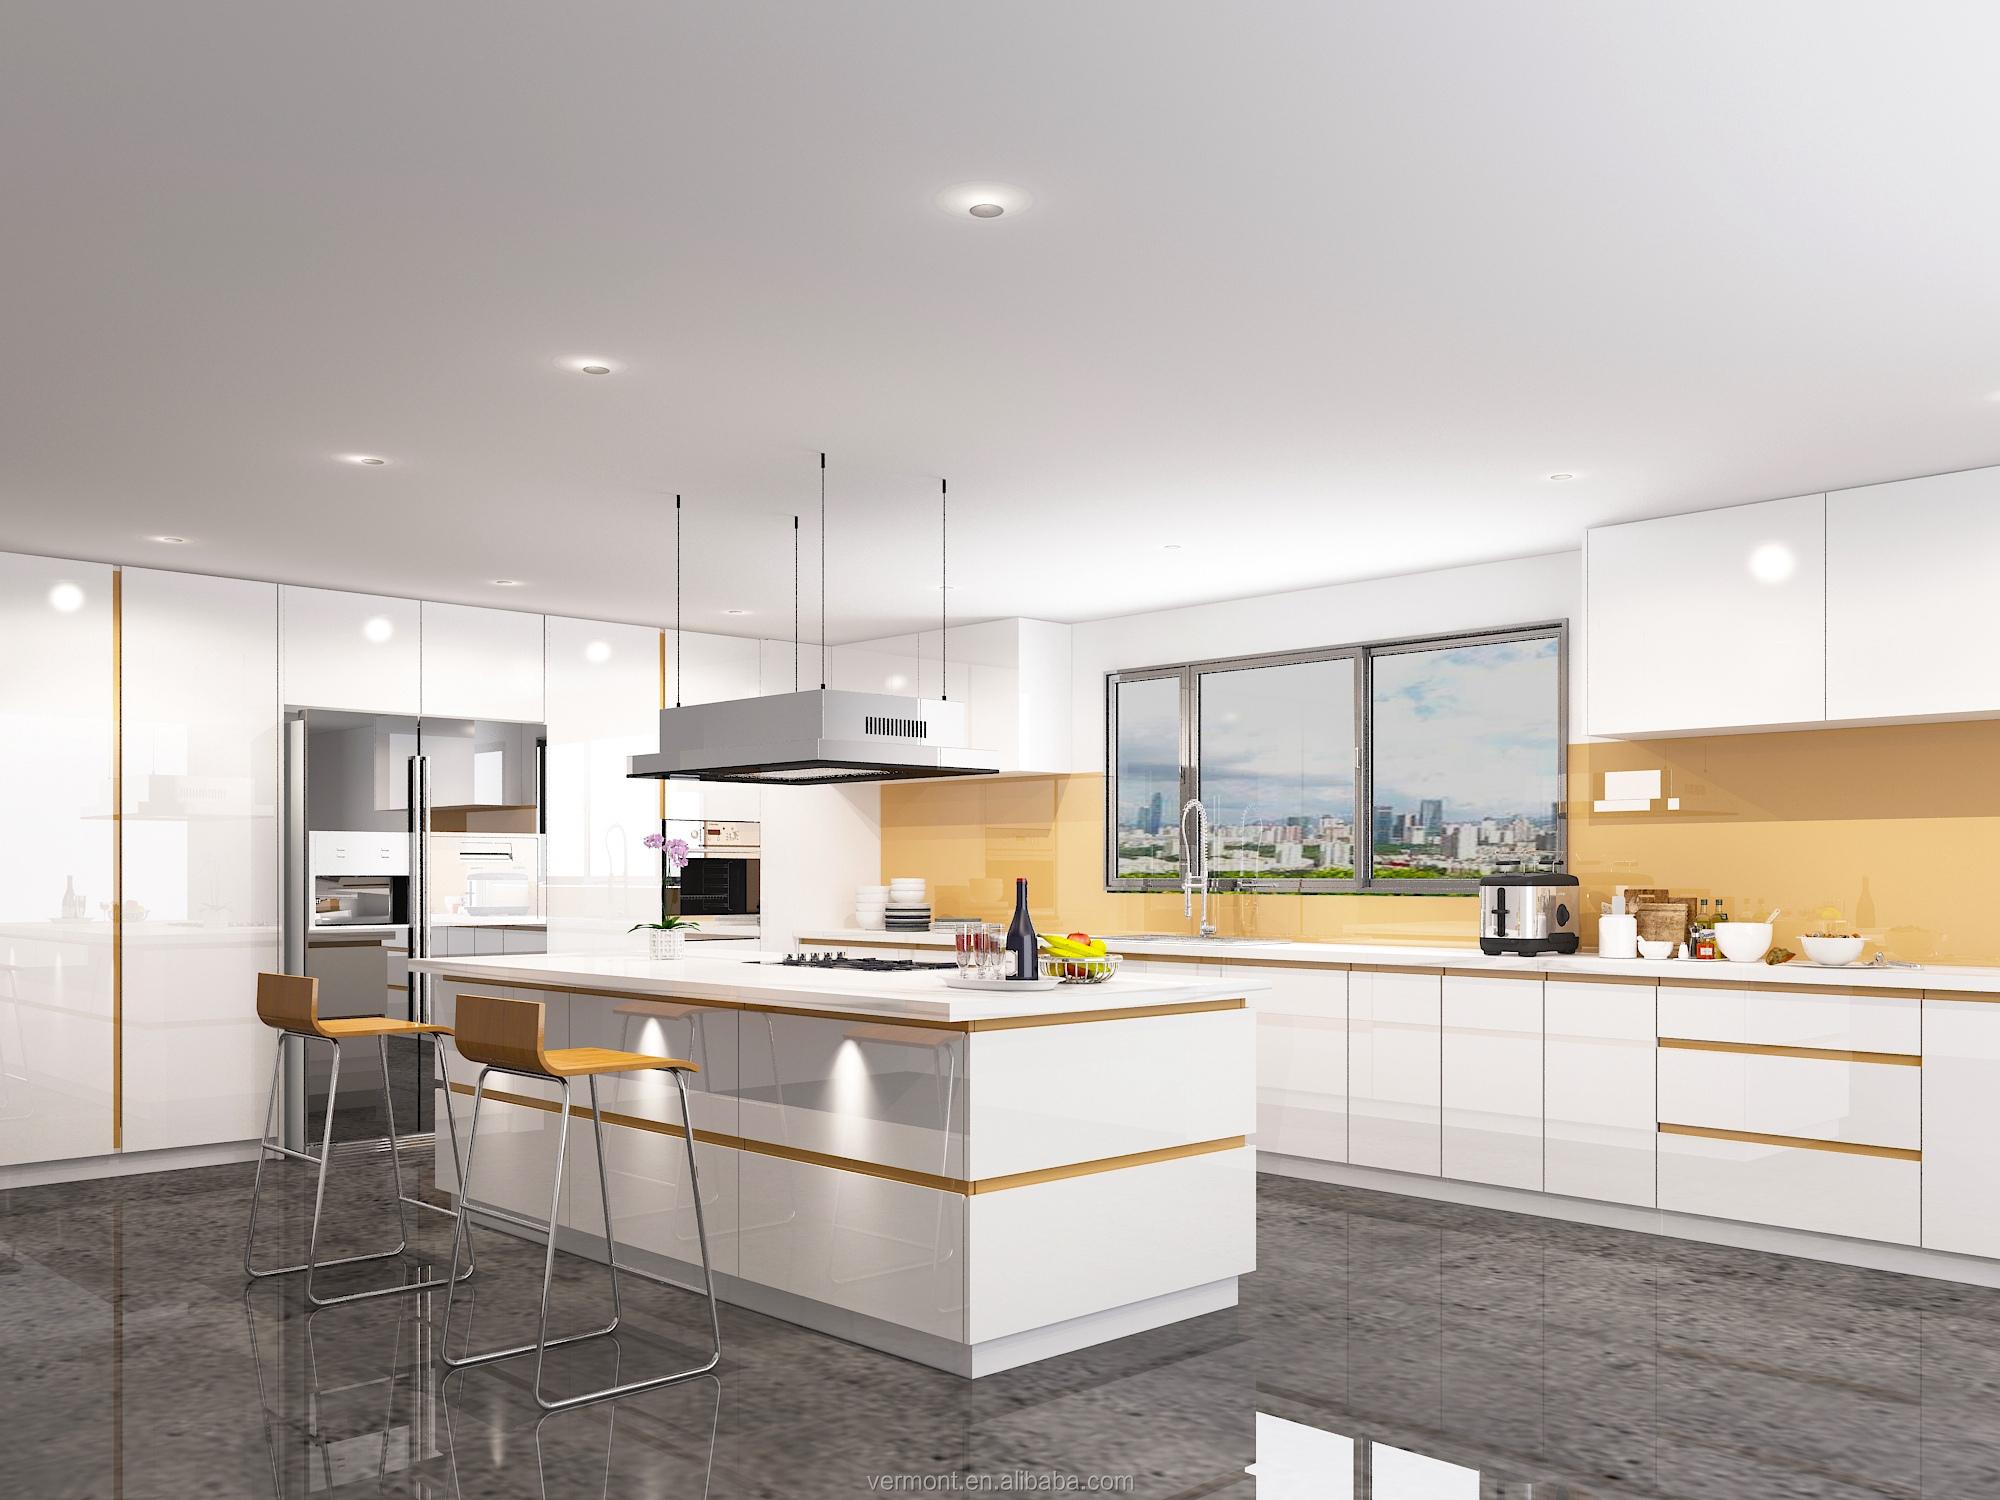 Kabinet Dapur Modern Mdf 2019 Desain Furnitur Kecil Kabinet Aluminium Rumah Flat Pack Buy Aluminium Kabinet Dapur Desain Mdf Kabinet Dapur Modern Product On Alibaba Com